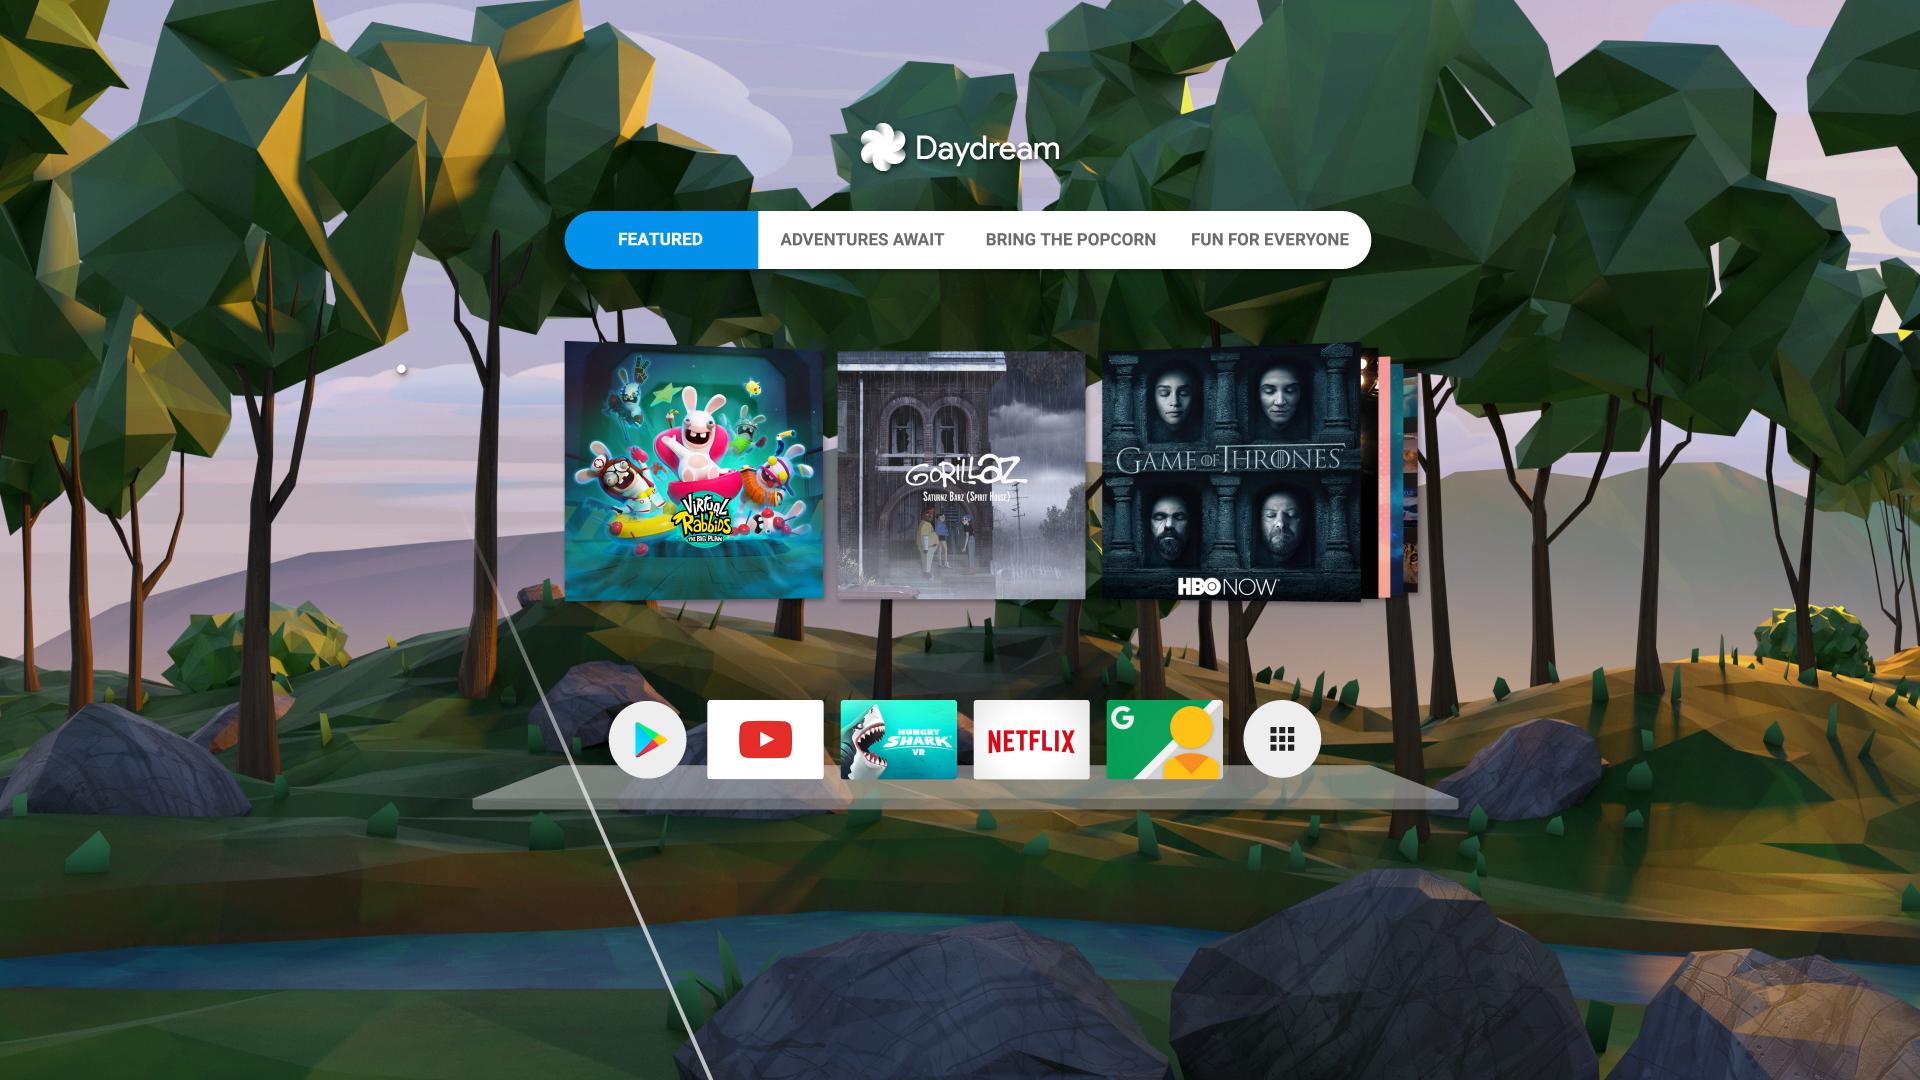 Google Daydream Home